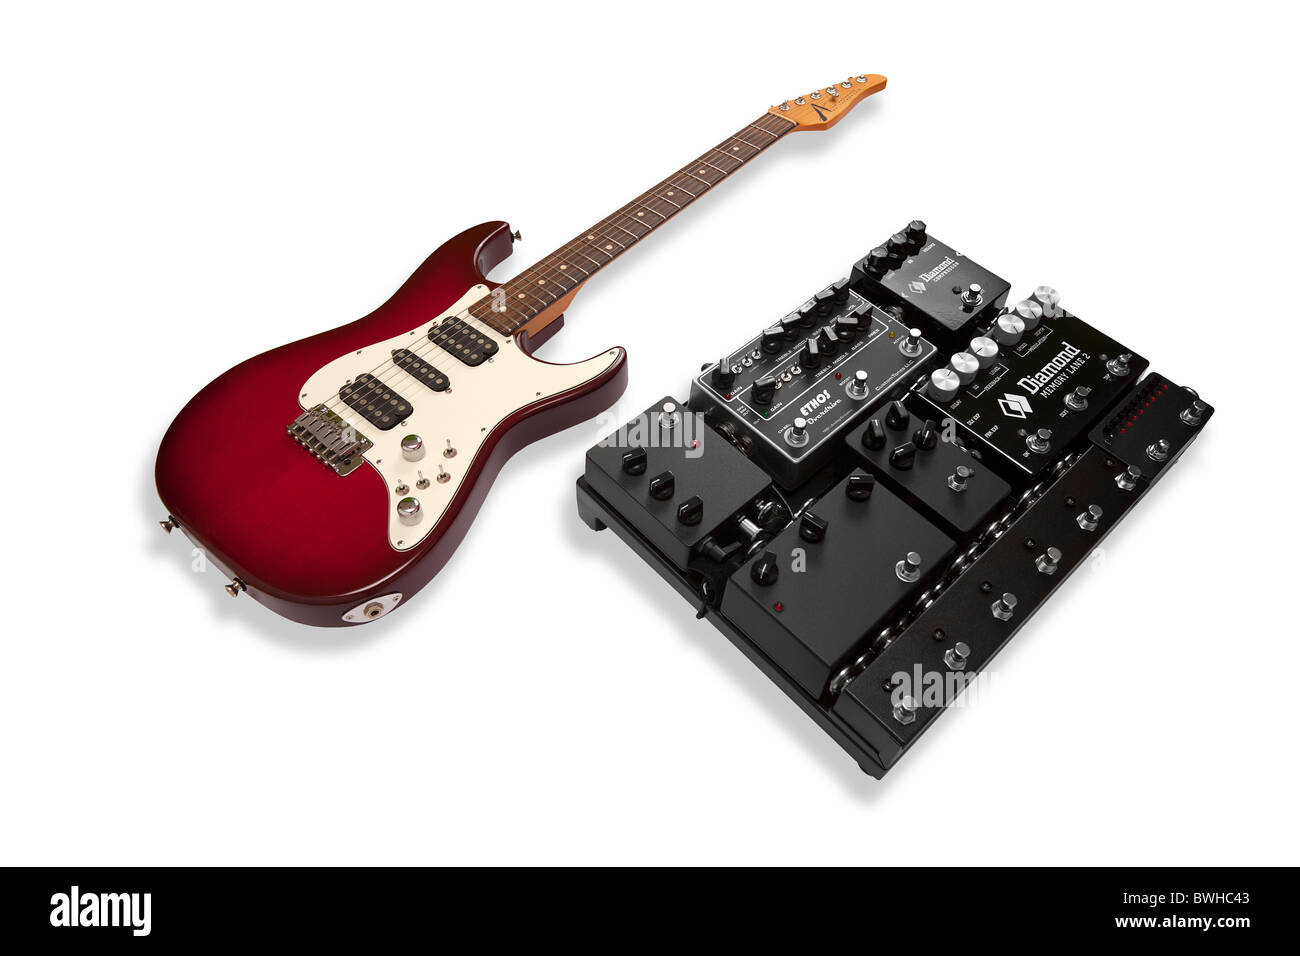 guitare stock photos guitare stock images alamy. Black Bedroom Furniture Sets. Home Design Ideas